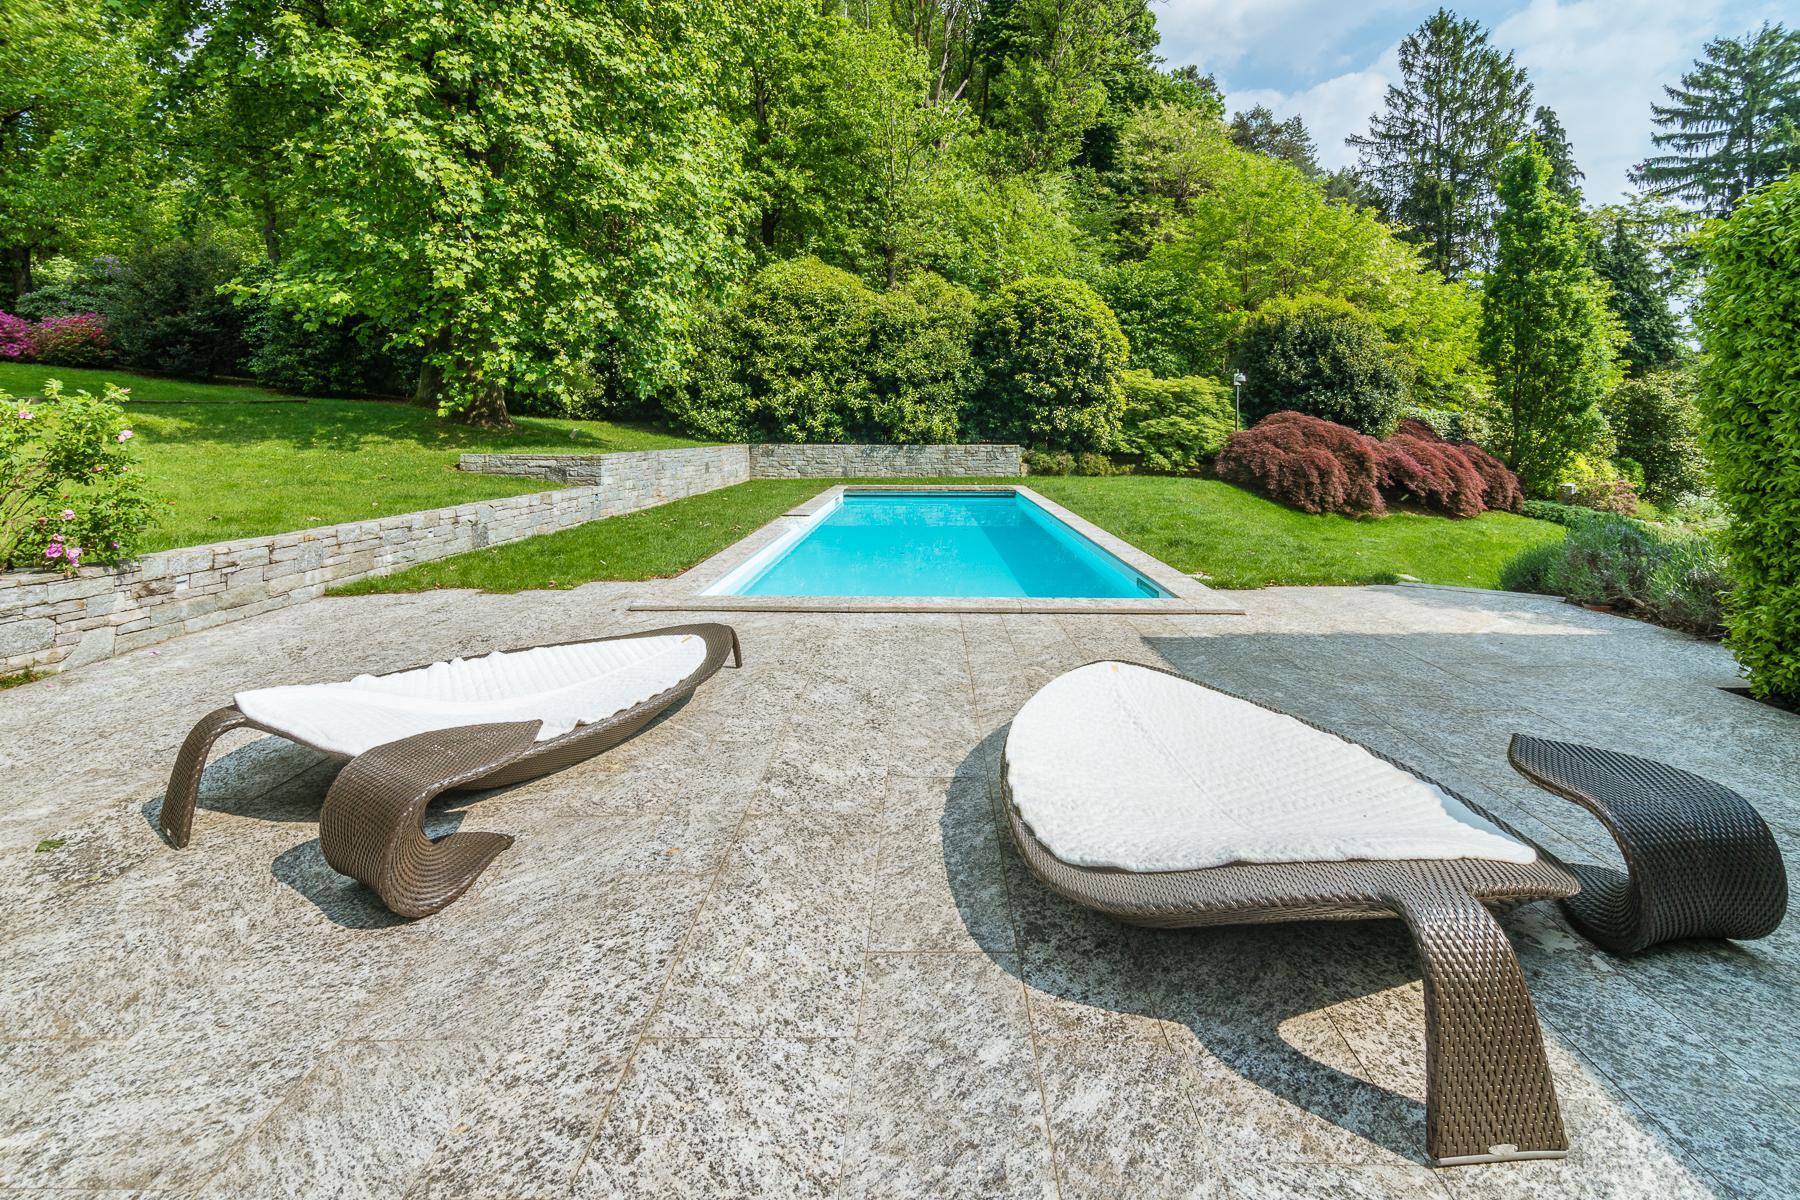 Maggiore湖泊生态友好设计独特的别墅 - 3